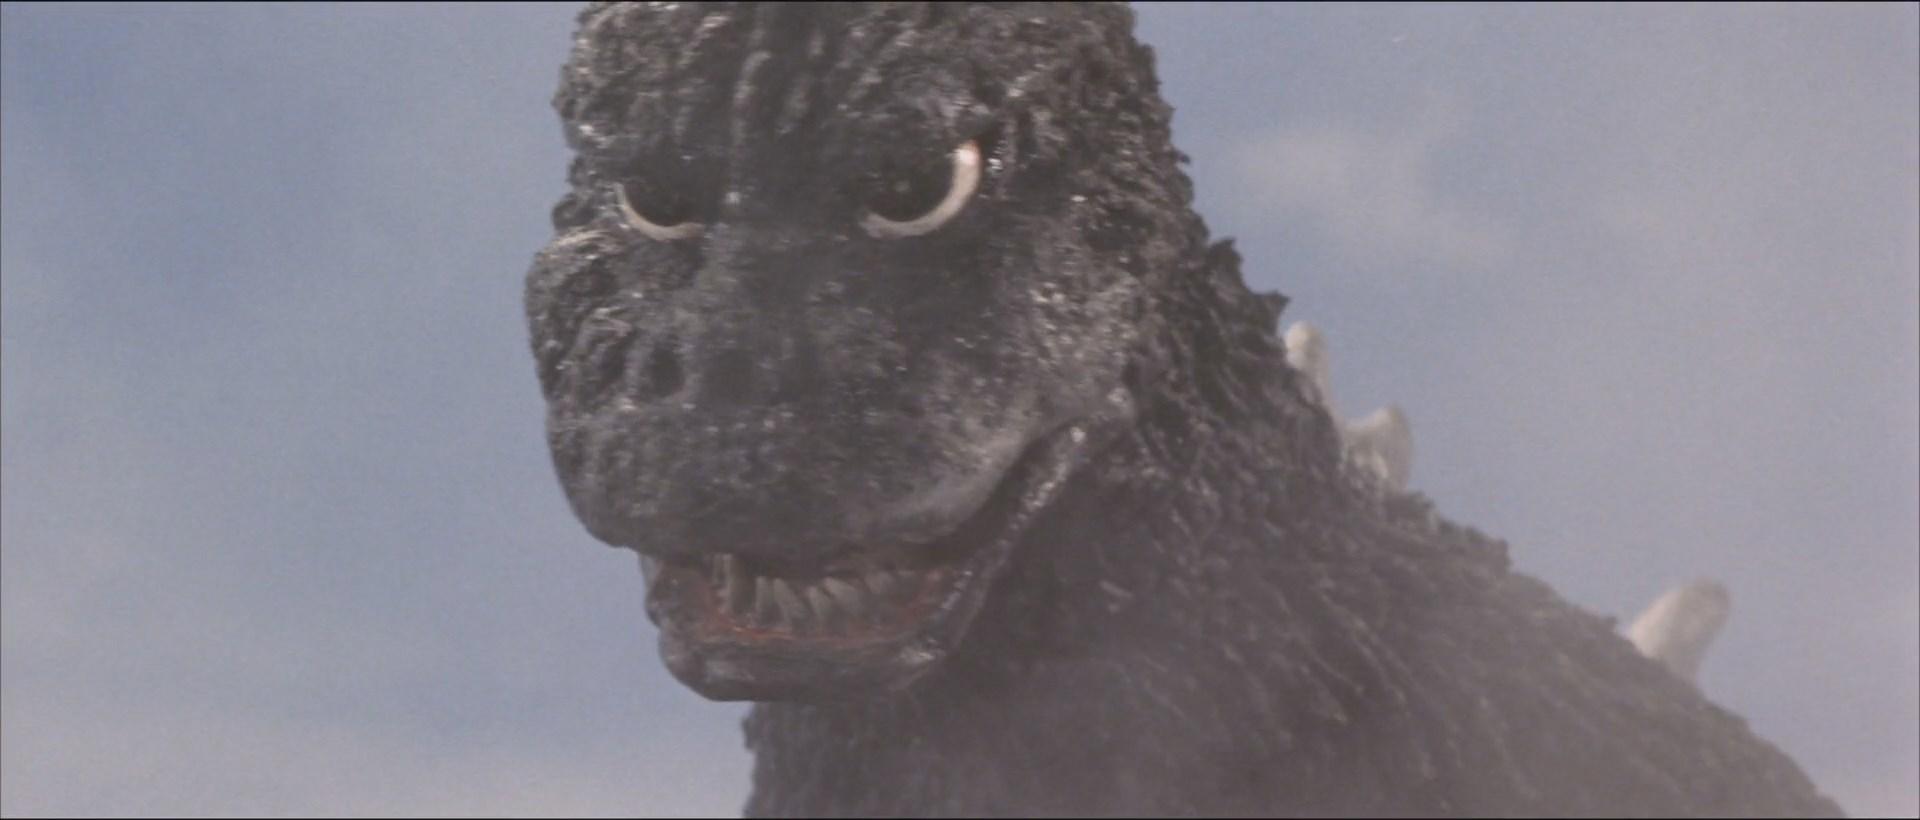 Godzilla vs. Mechagodzilla / Gojira tai Mekagojira (1974) [Criterion Collection]